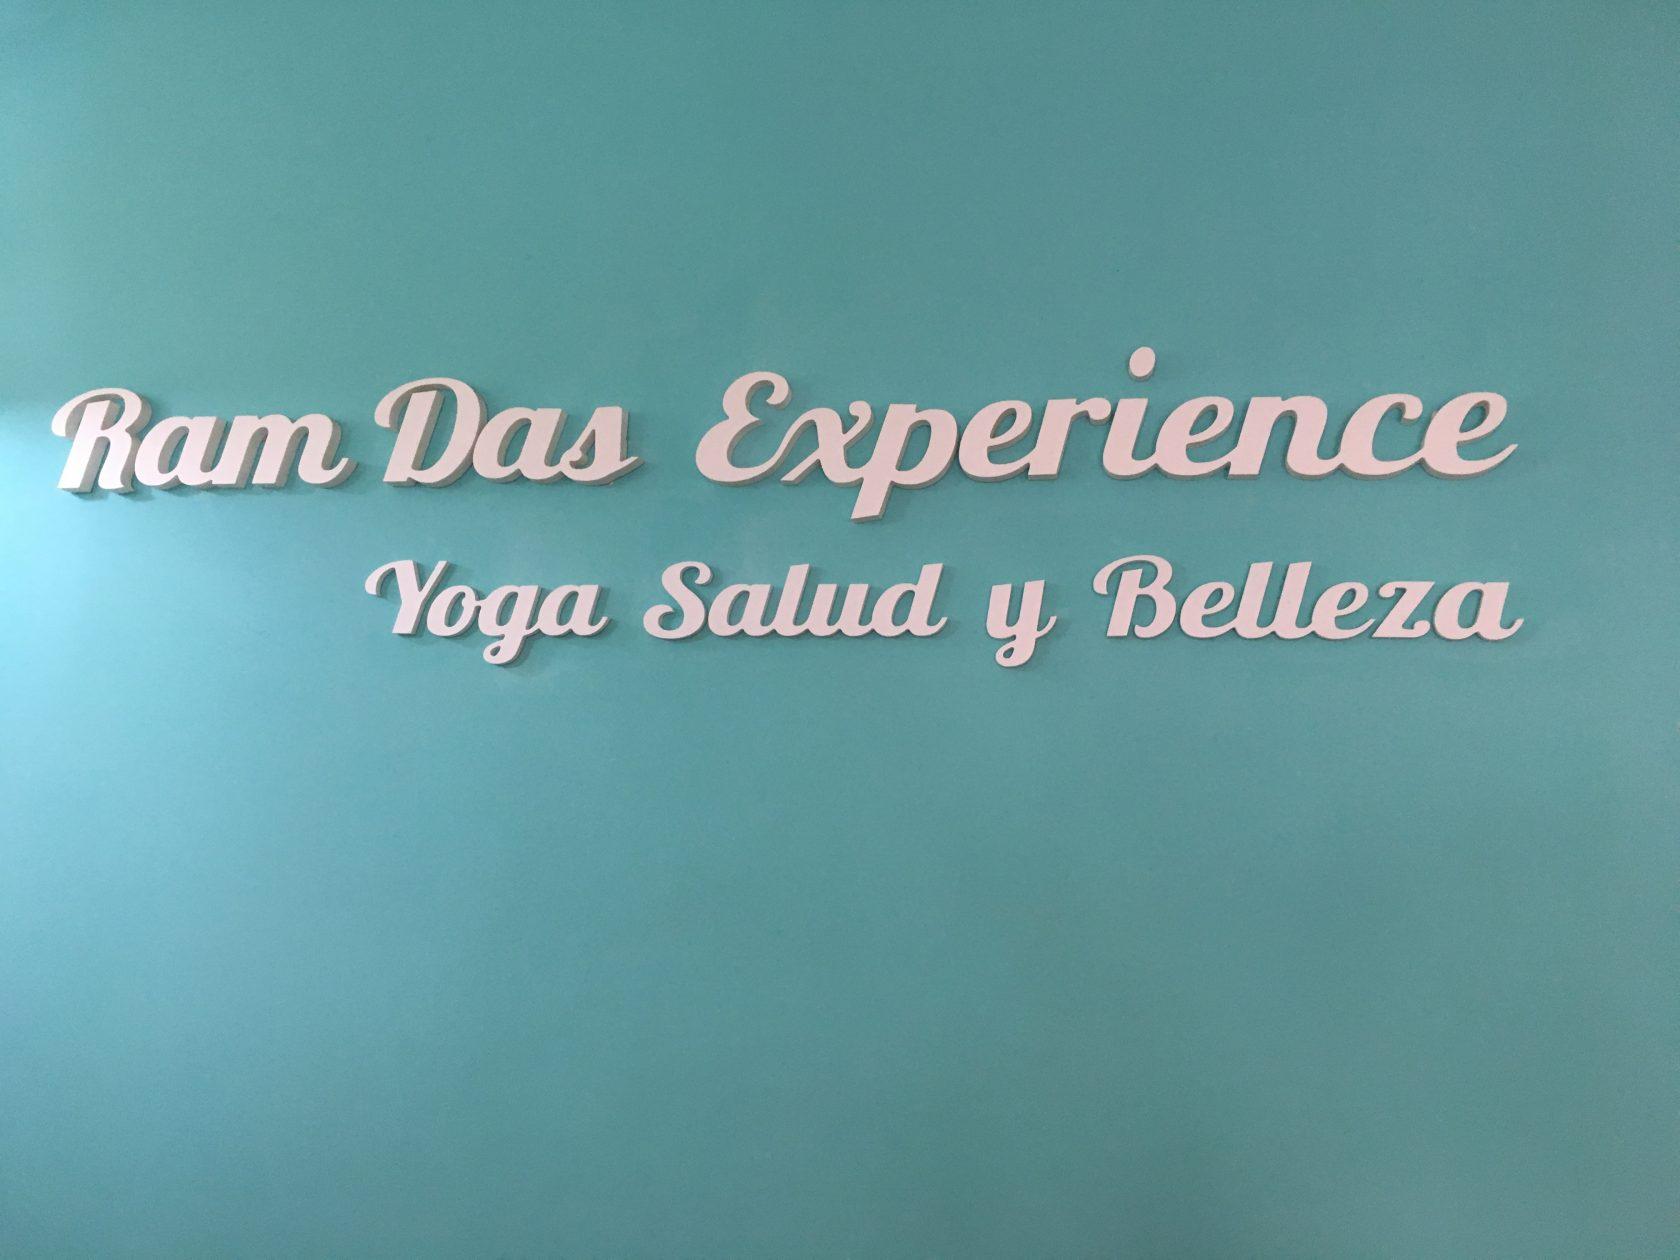 centro-Ram-Das-Experience